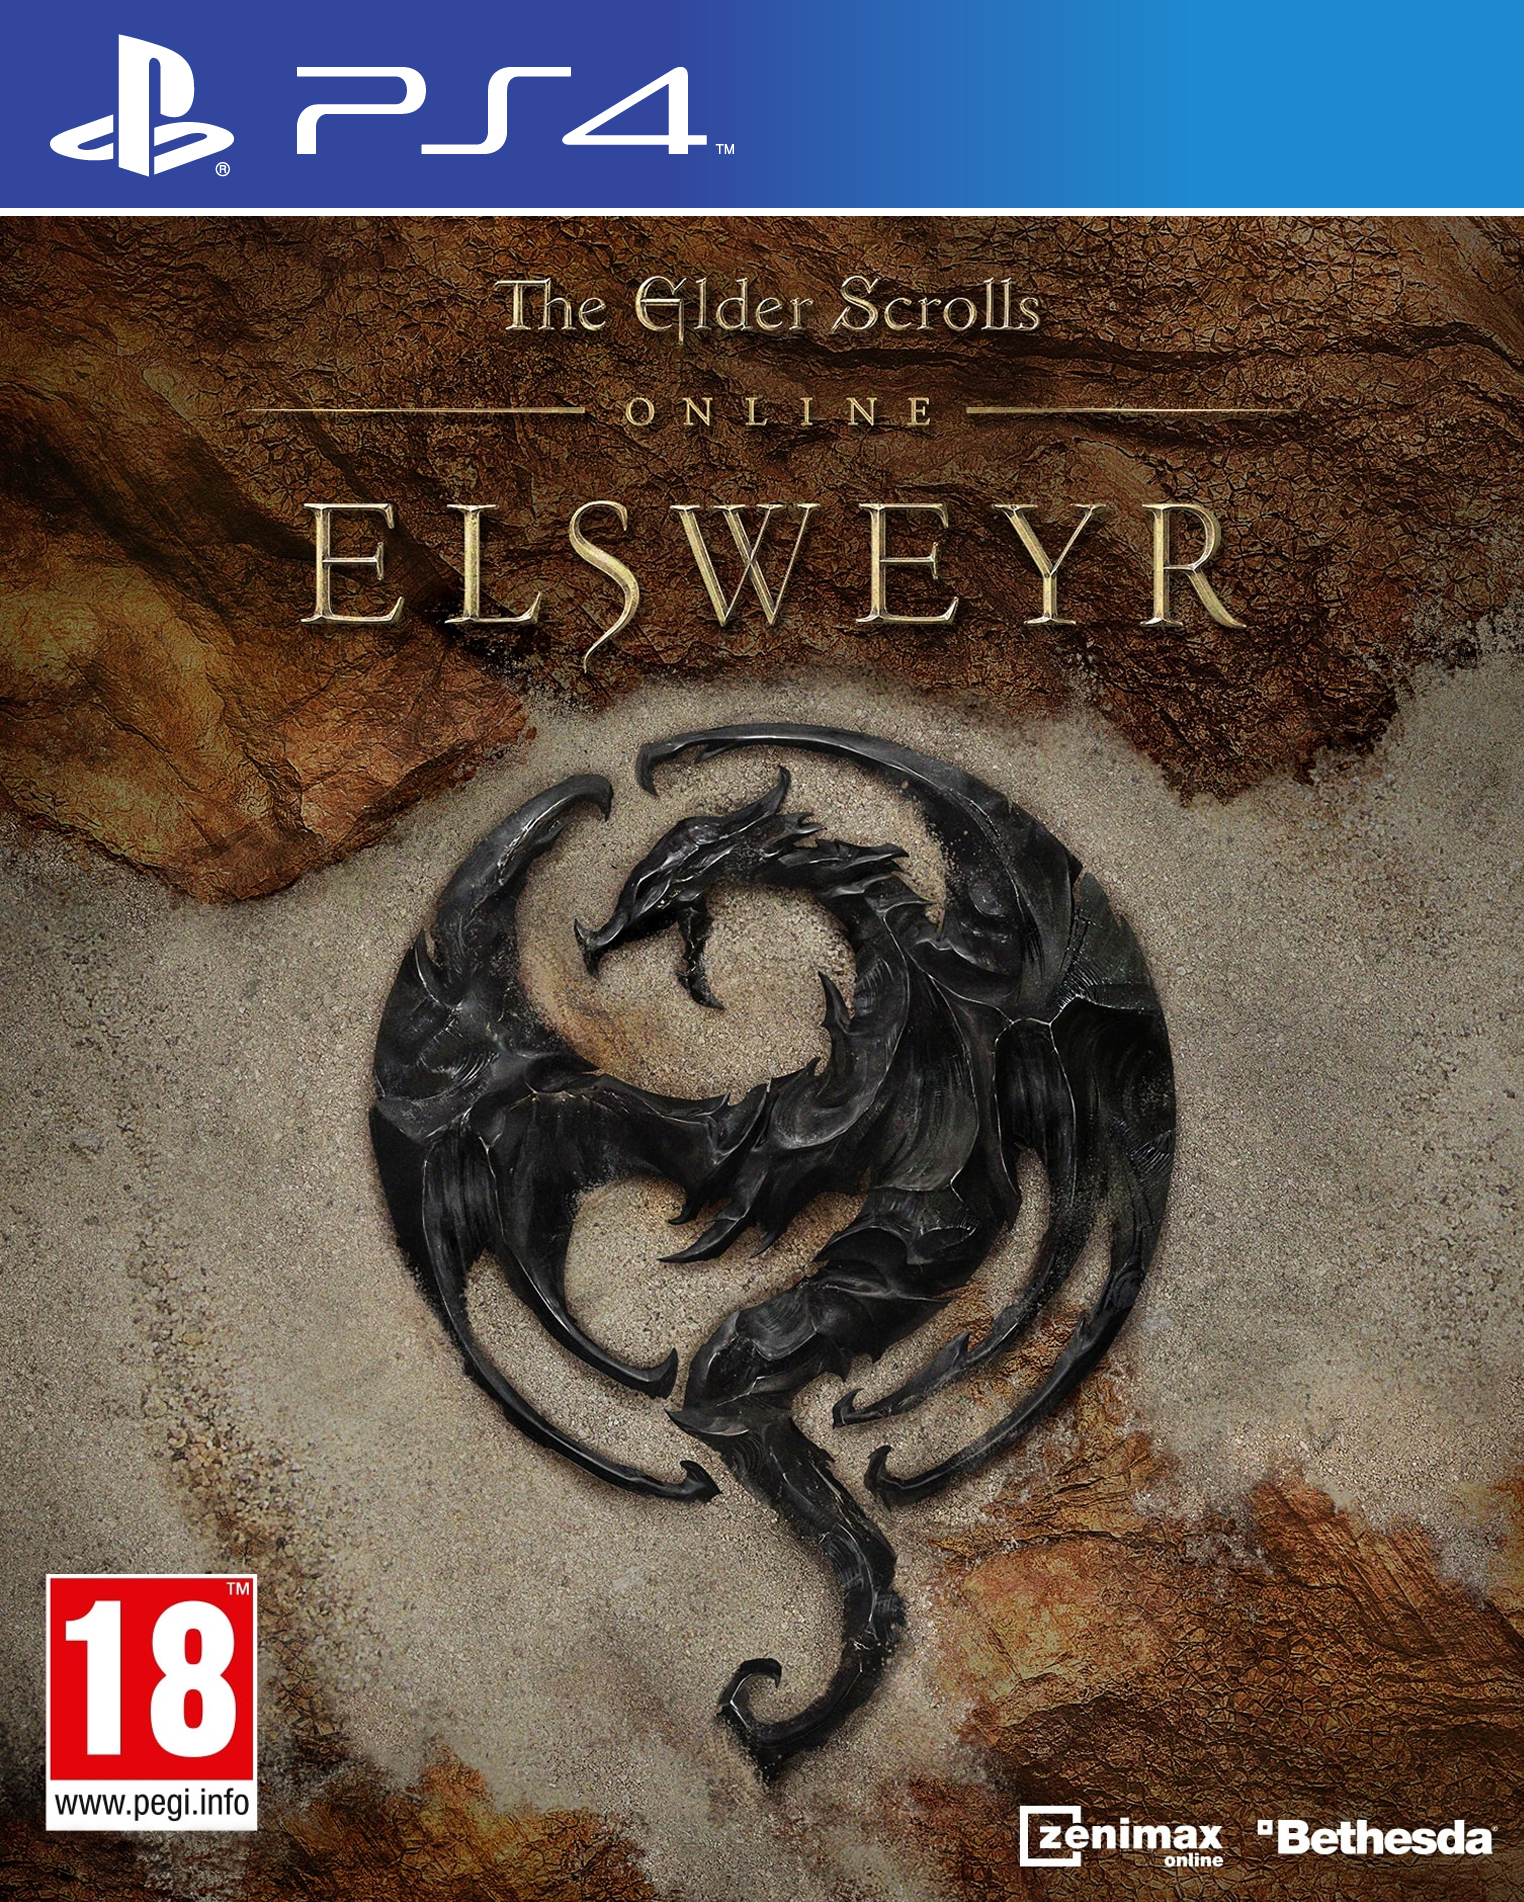 The Elder Scrolls: Online - Elsweyr